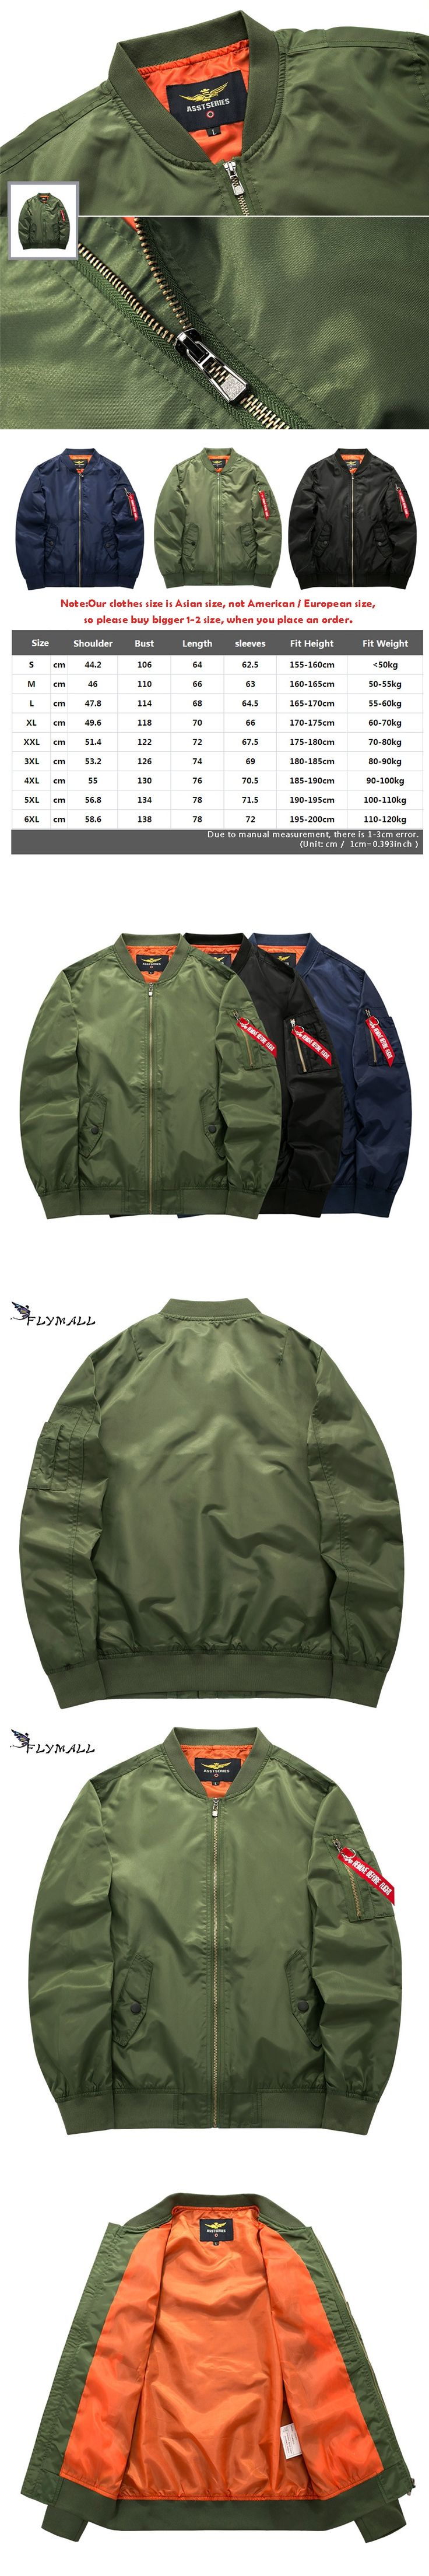 Bomber Jacket 2017 Men's Fashion Thin Warm Autumn Winter Military Motorcycle Jackets Men Flight Ma-1 Pilot Air Force Brand Coat